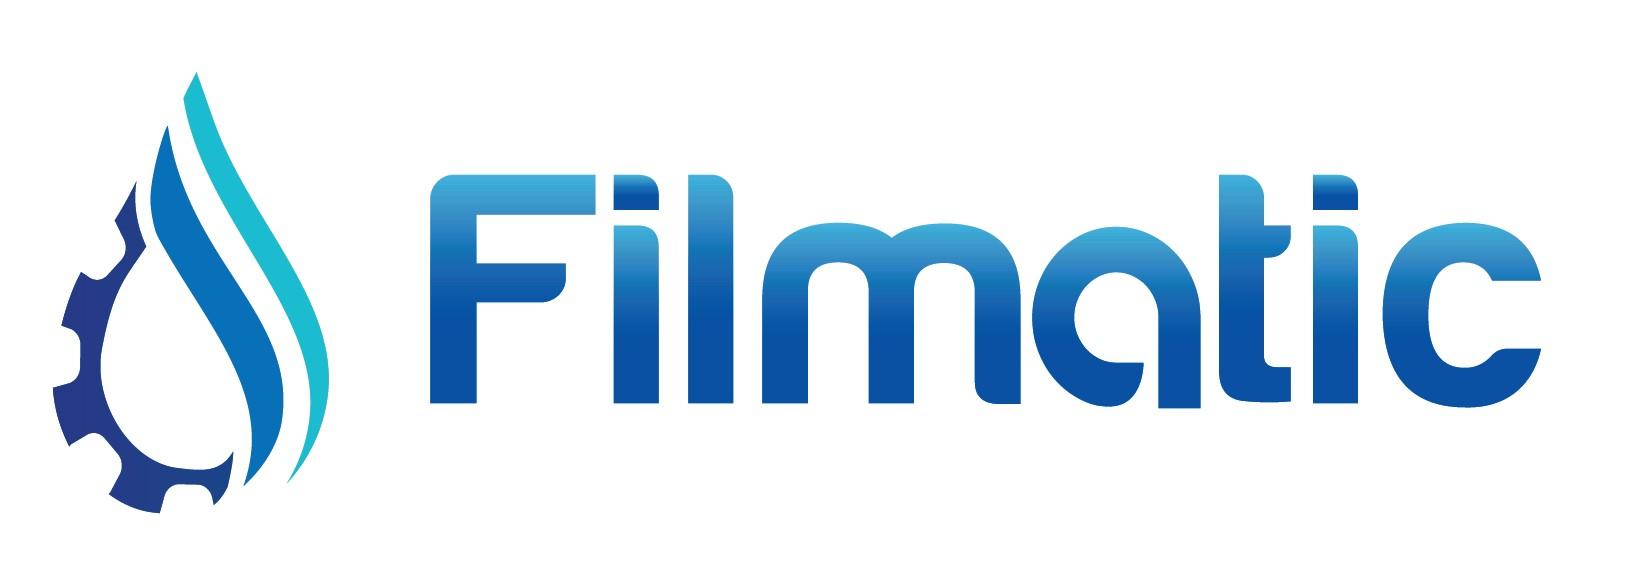 Filmatic logo.jpg